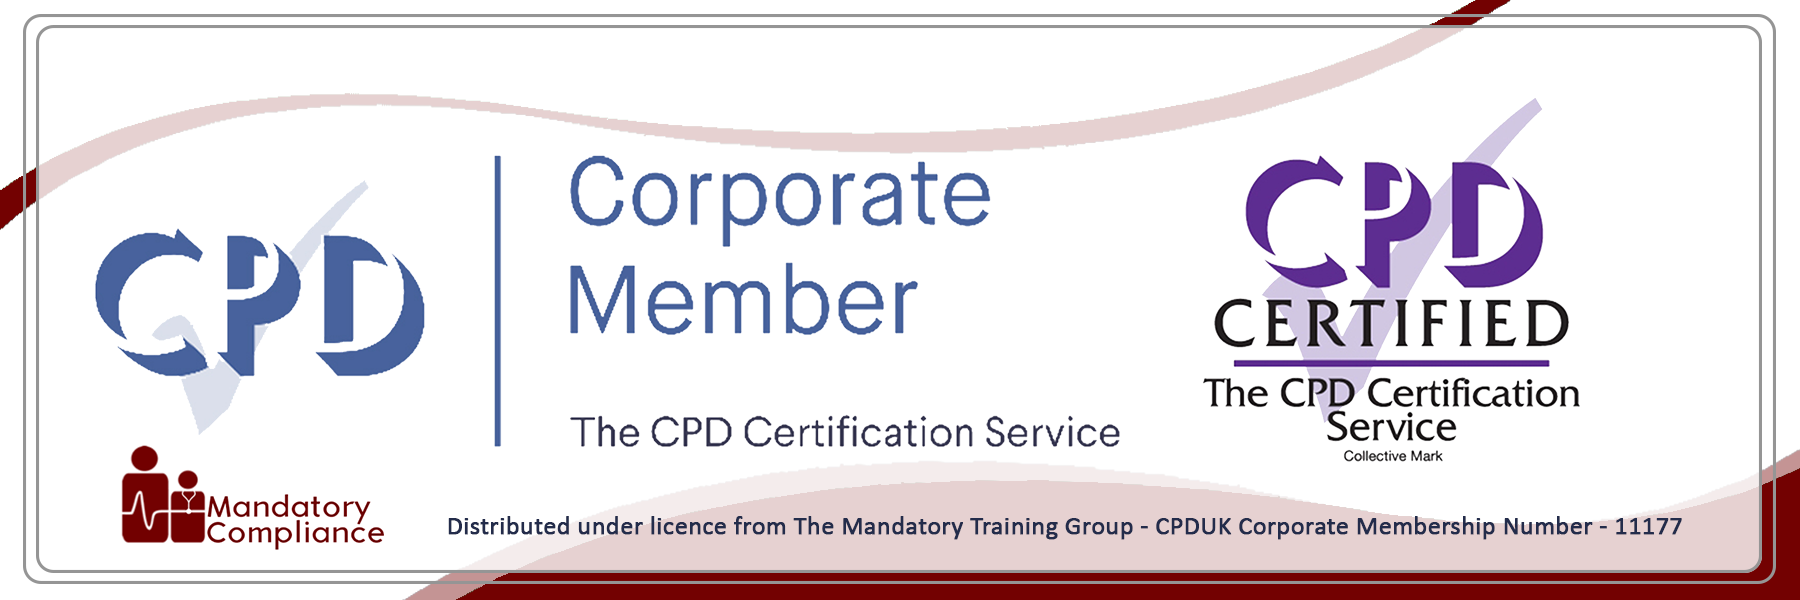 Mandatory Training for Dental Practice Staff - Enhanced CPD - E-Learning Courses - Mandatory Compliance UK -